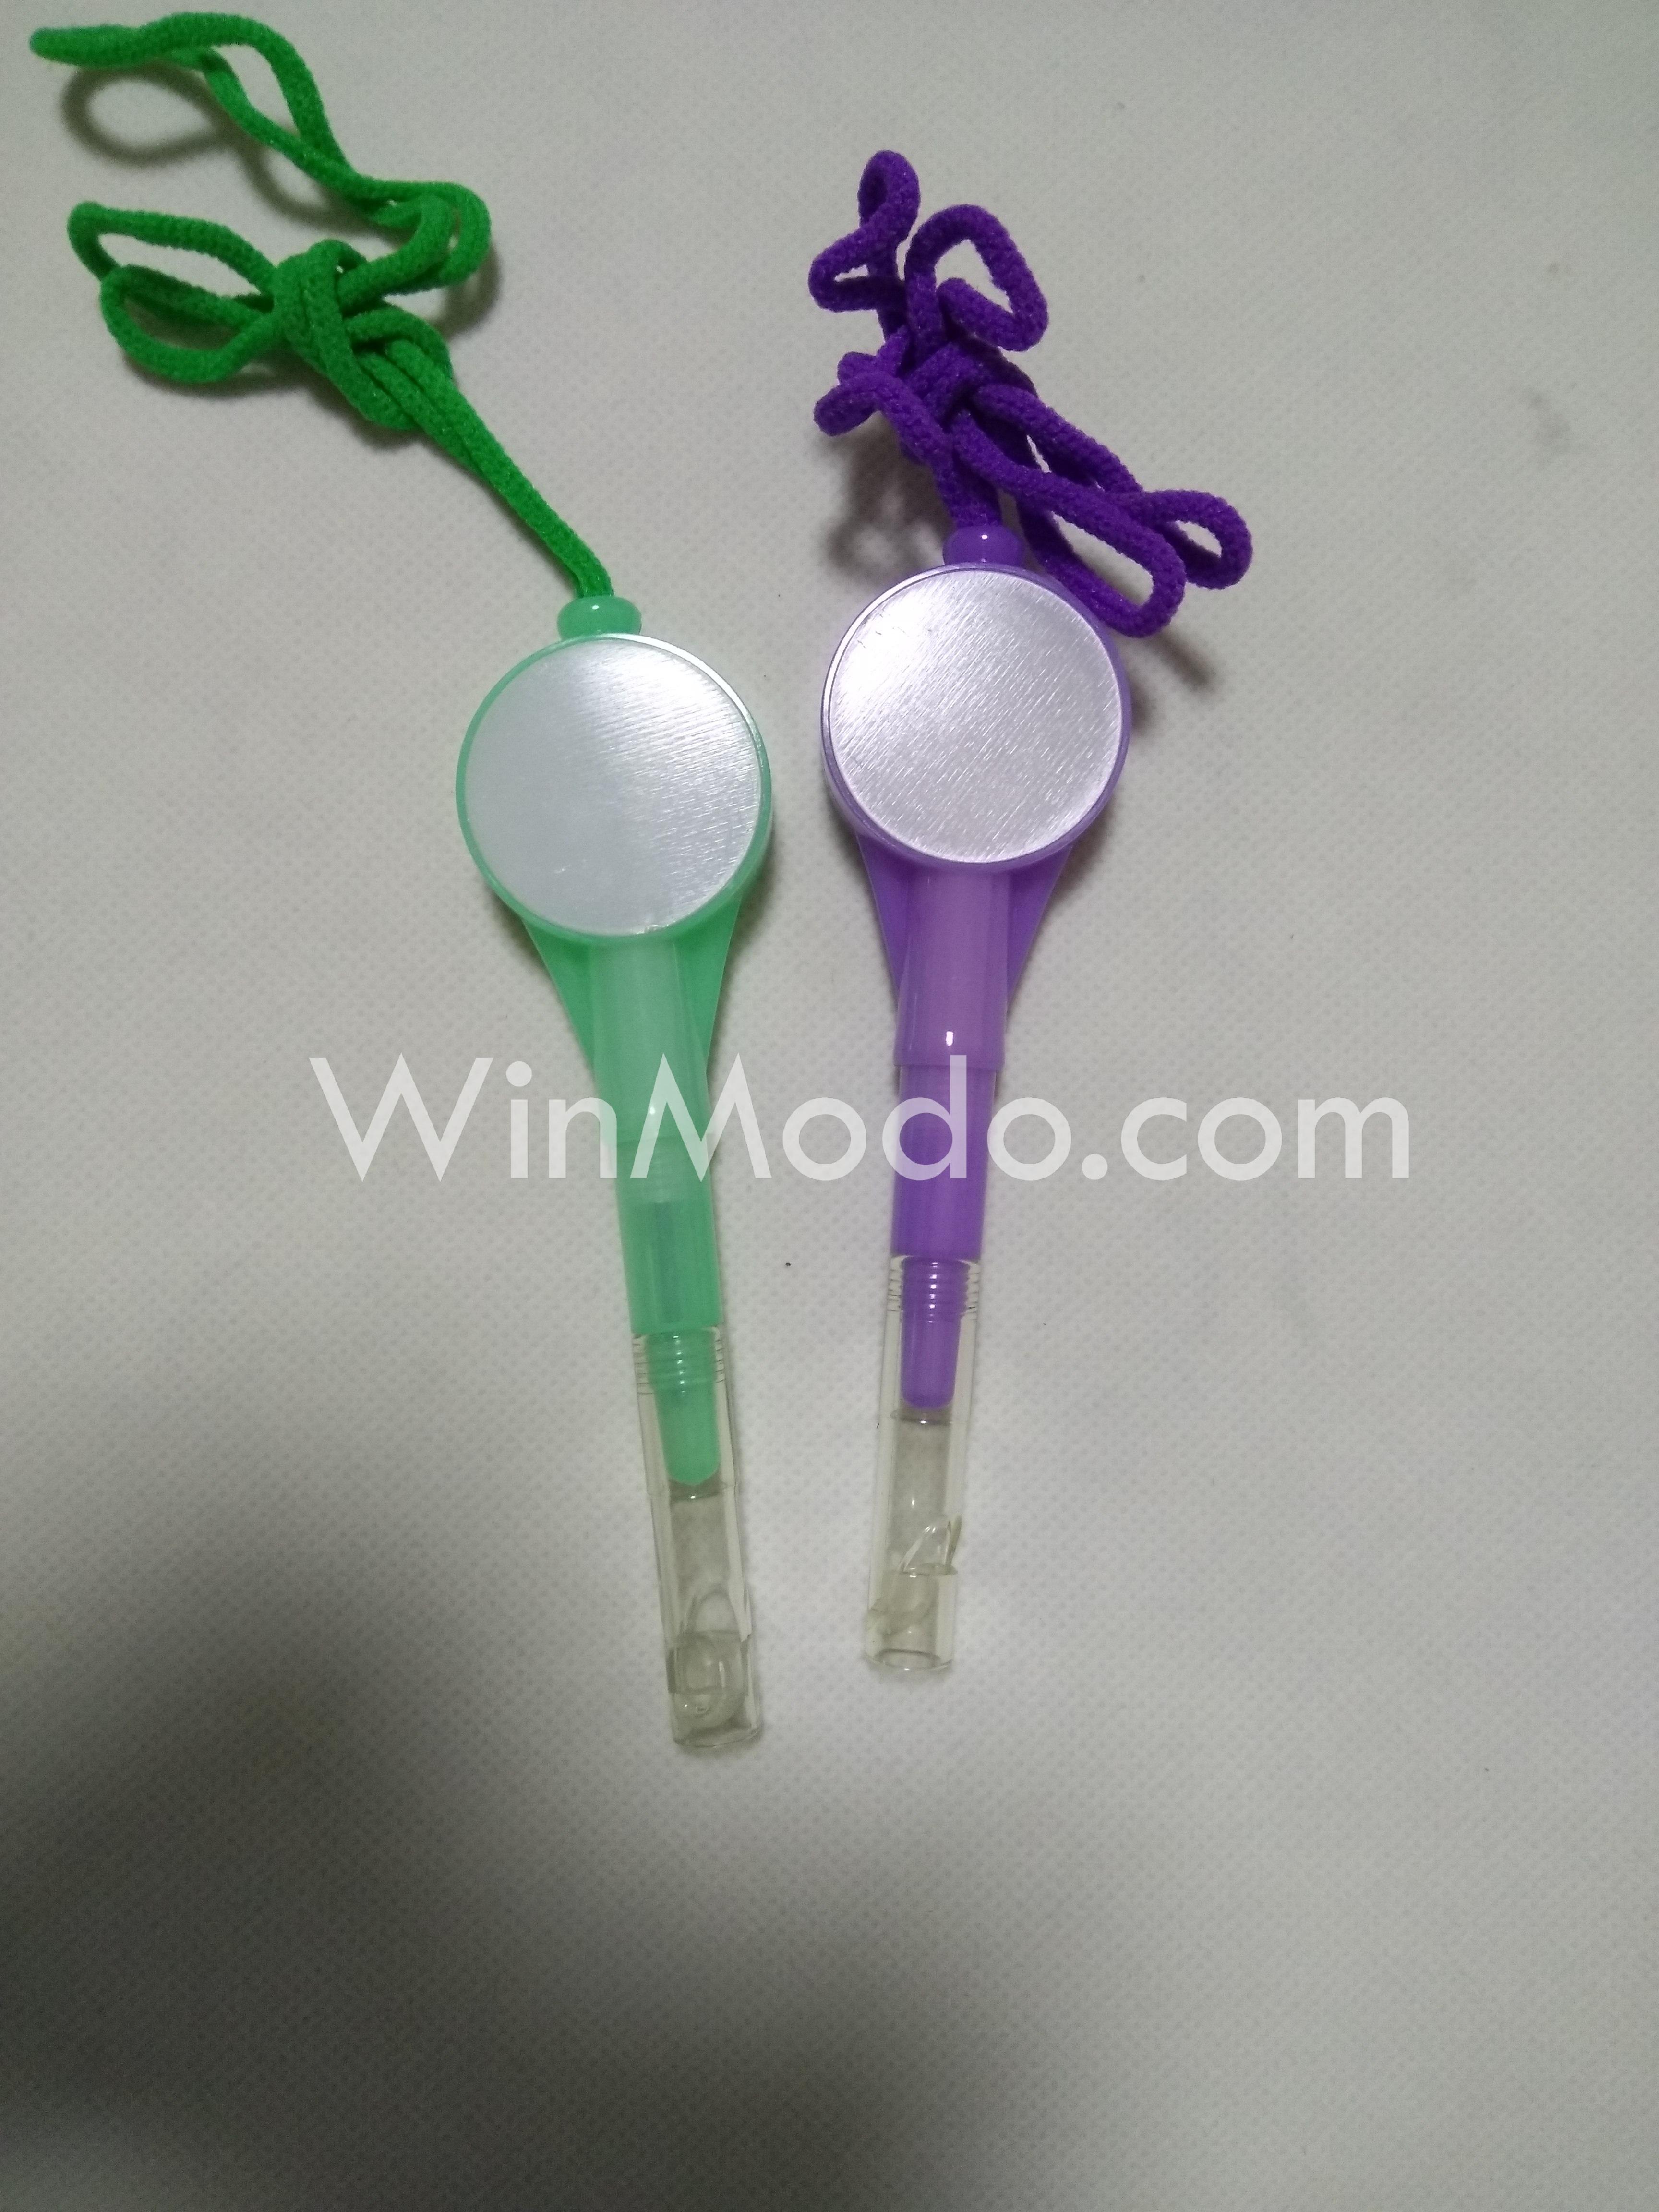 Whistle Pens